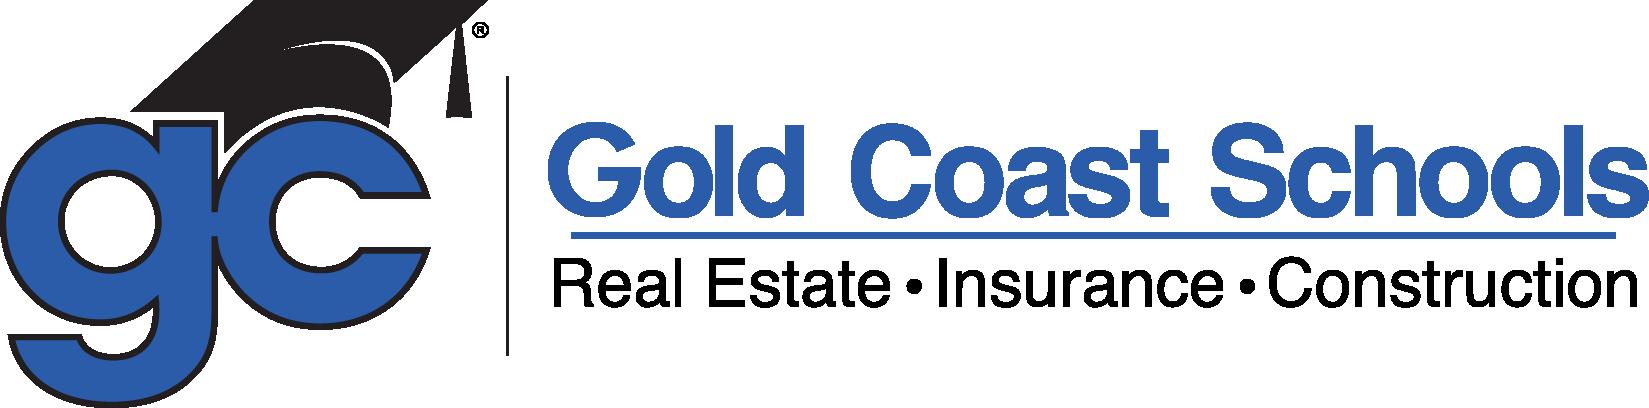 Gold Coast Professional Schools, LLC Company Logo